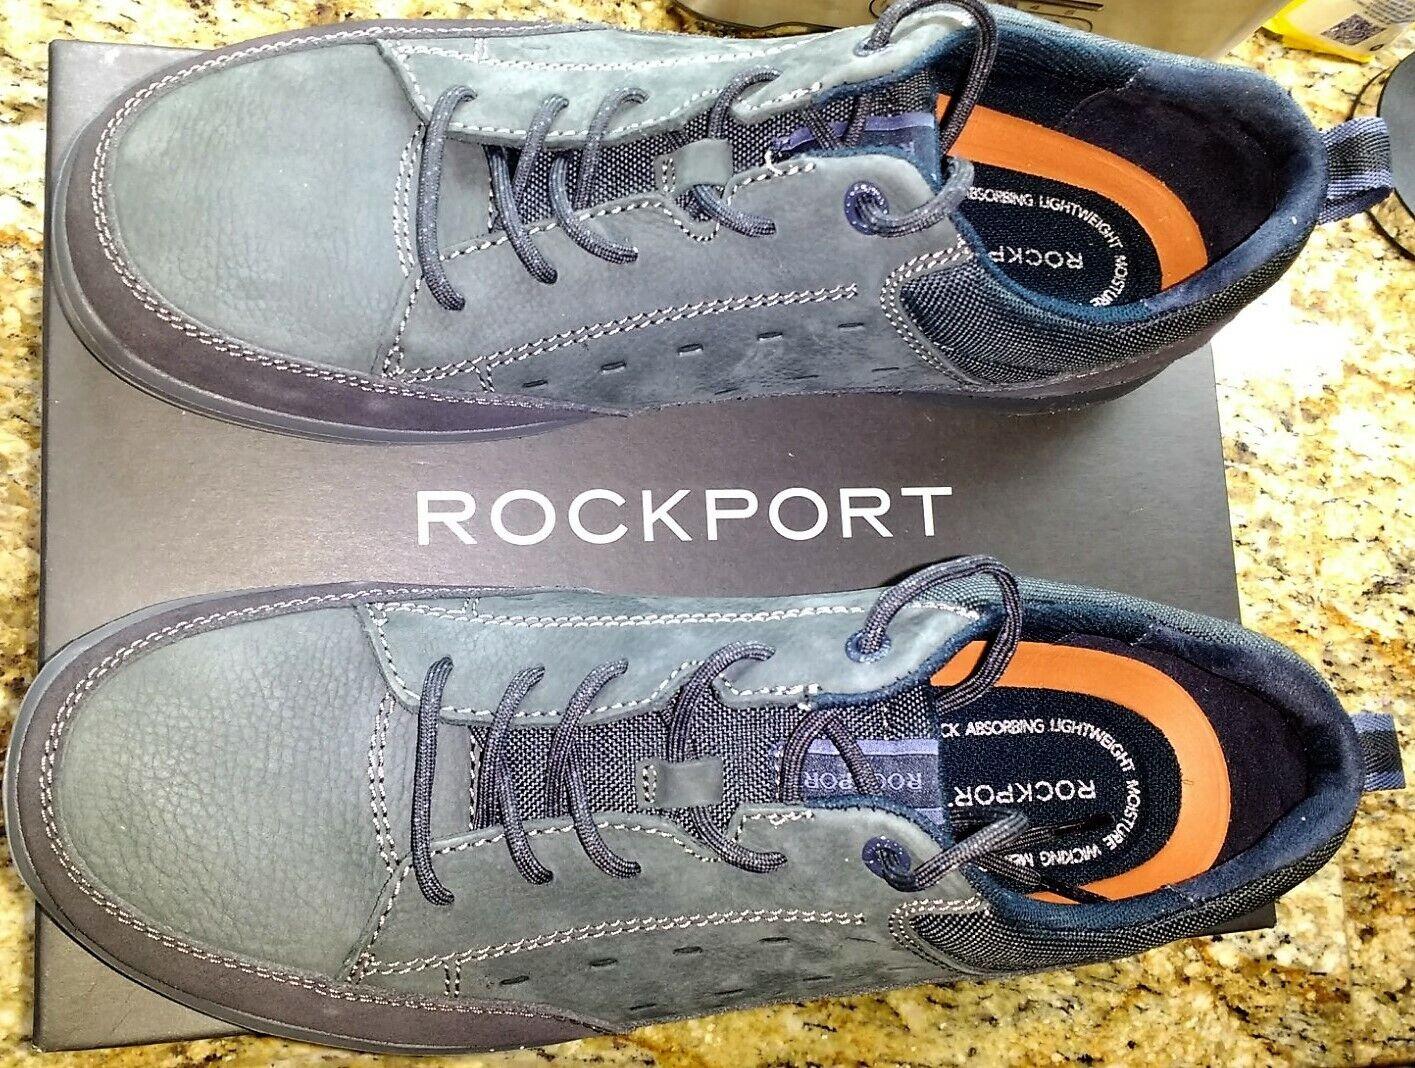 Rockport Men's Rydley Lace Up Up Up Athletic New Dress blu scarpe CG8396  NEW  12d9da